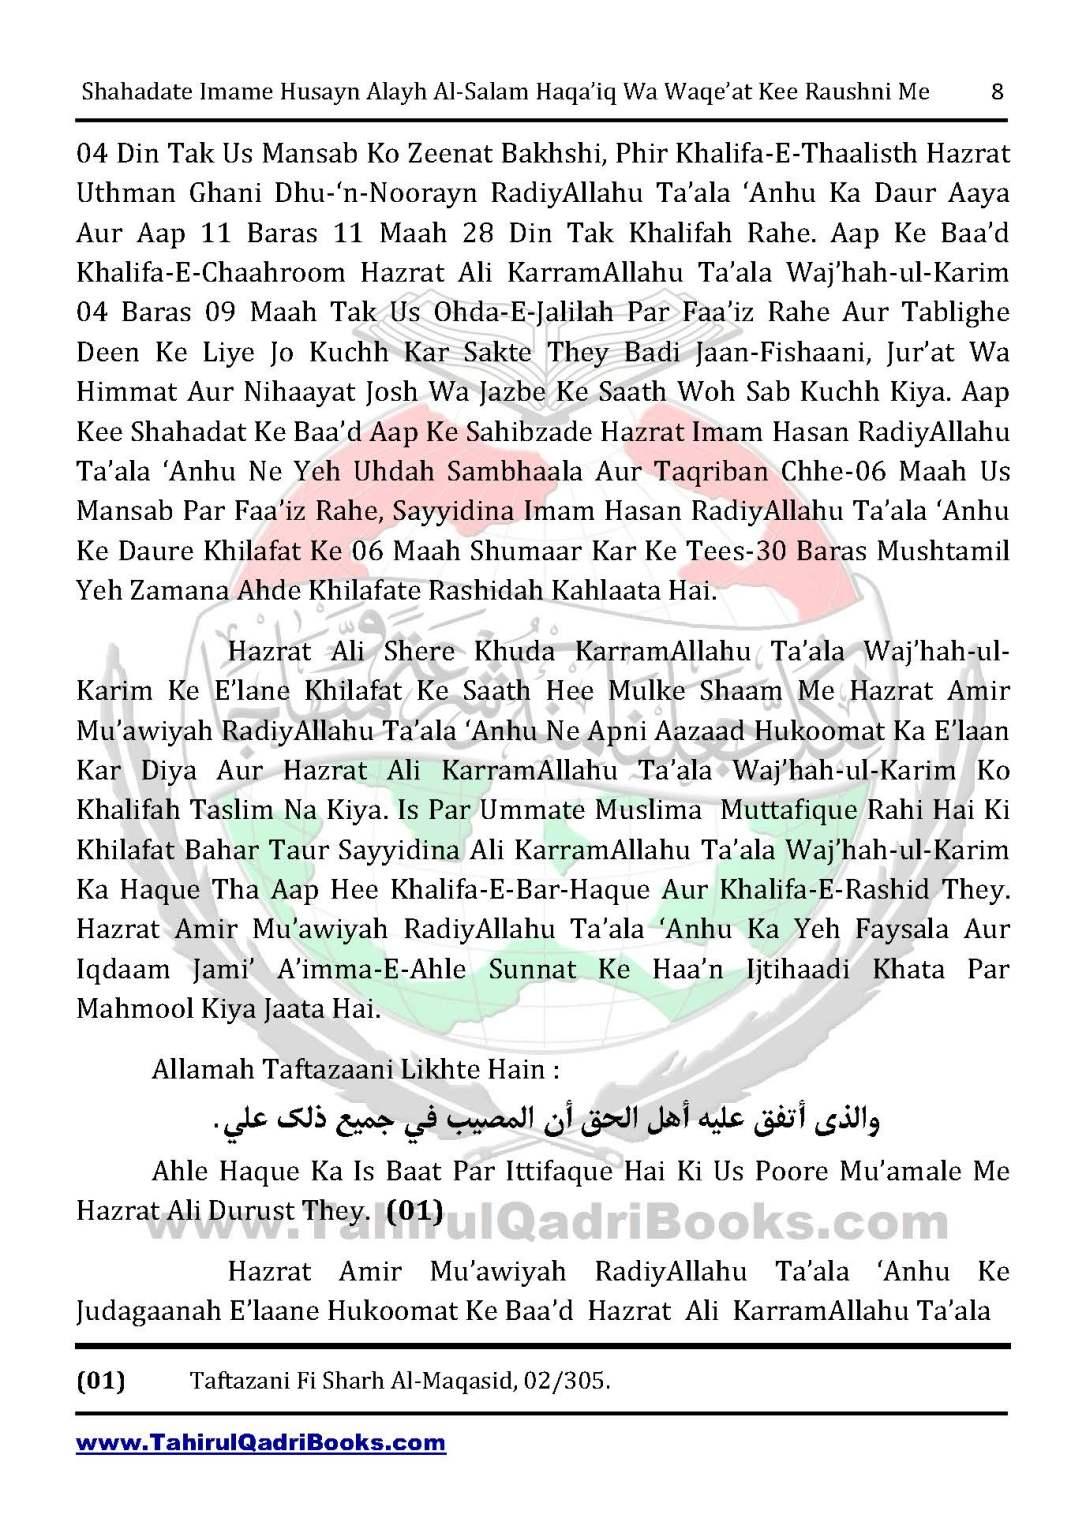 shahadate-imame-husayn-alayh-is-salam-haqaiq-wa-waqe_at-kee-raushni-me-in-roman-urdu-unlocked_Page_08